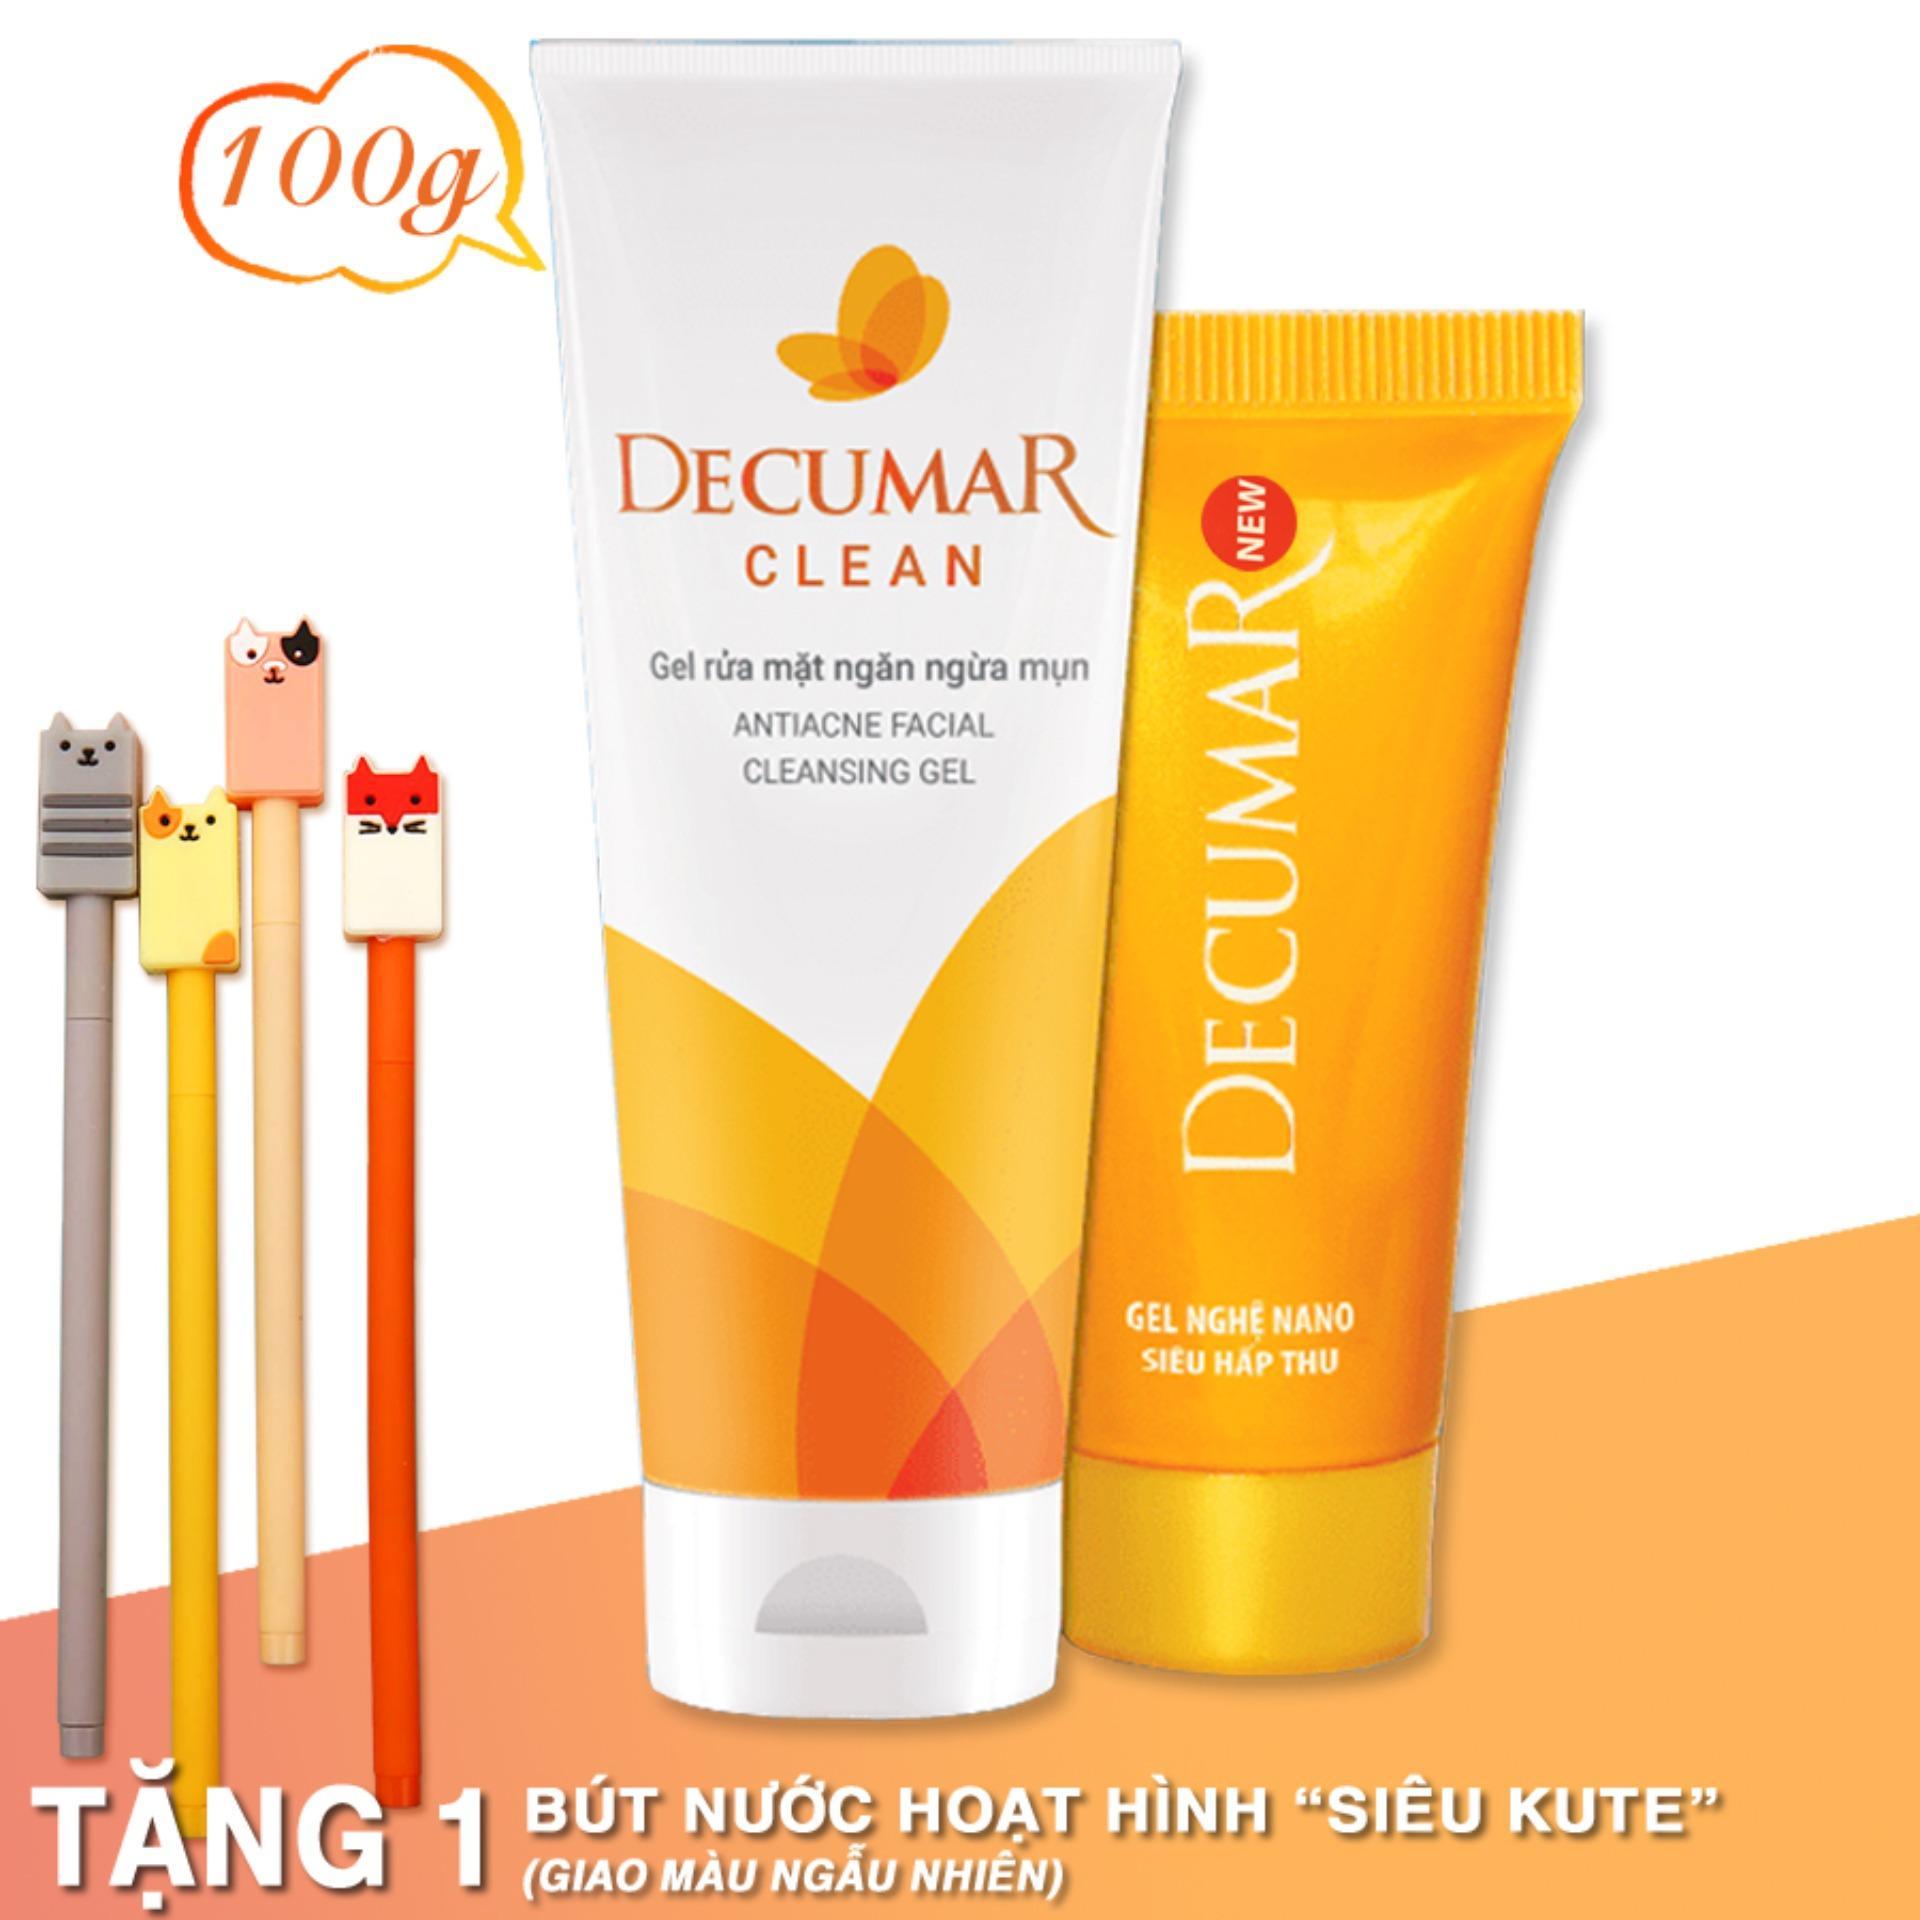 Bộ đôi trị mụn hiệu quả Decumar 20g - Decumar Clean 100g - kem trị mụn, kem trị thâm, kem nghệ decumar, sữa rửa mặt decumar clean nhập khẩu